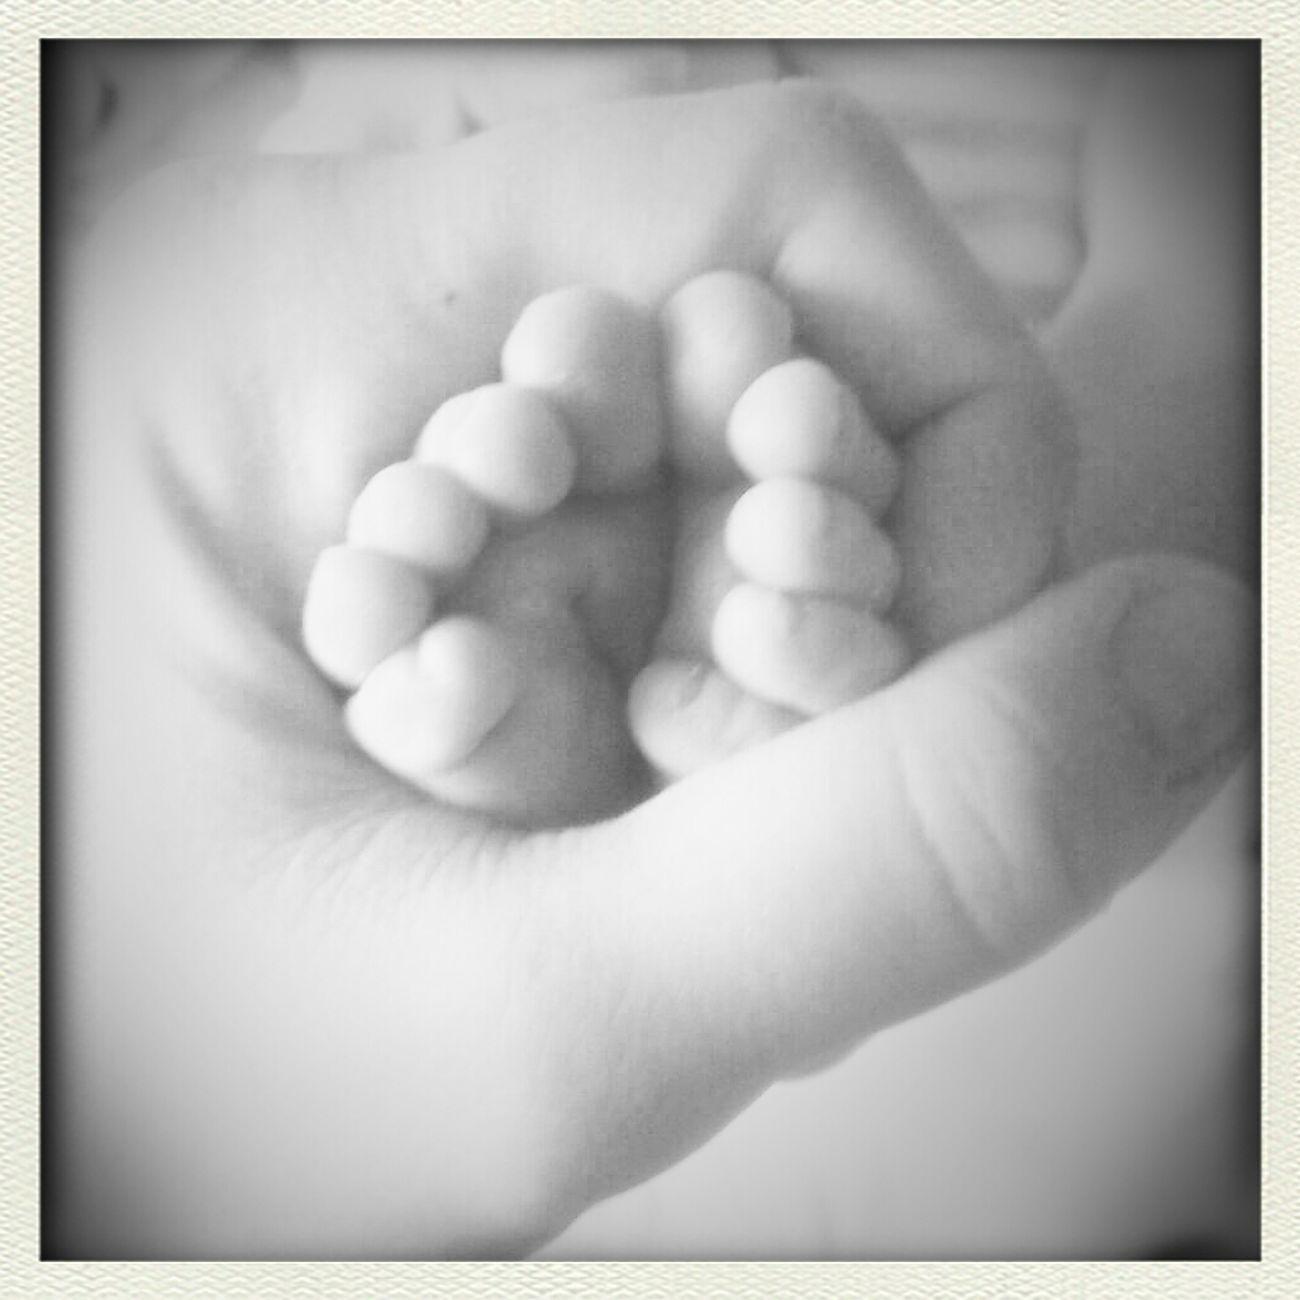 Newborn TheMinimals (less Edit Juxt Photography) Toes Blackandwhite